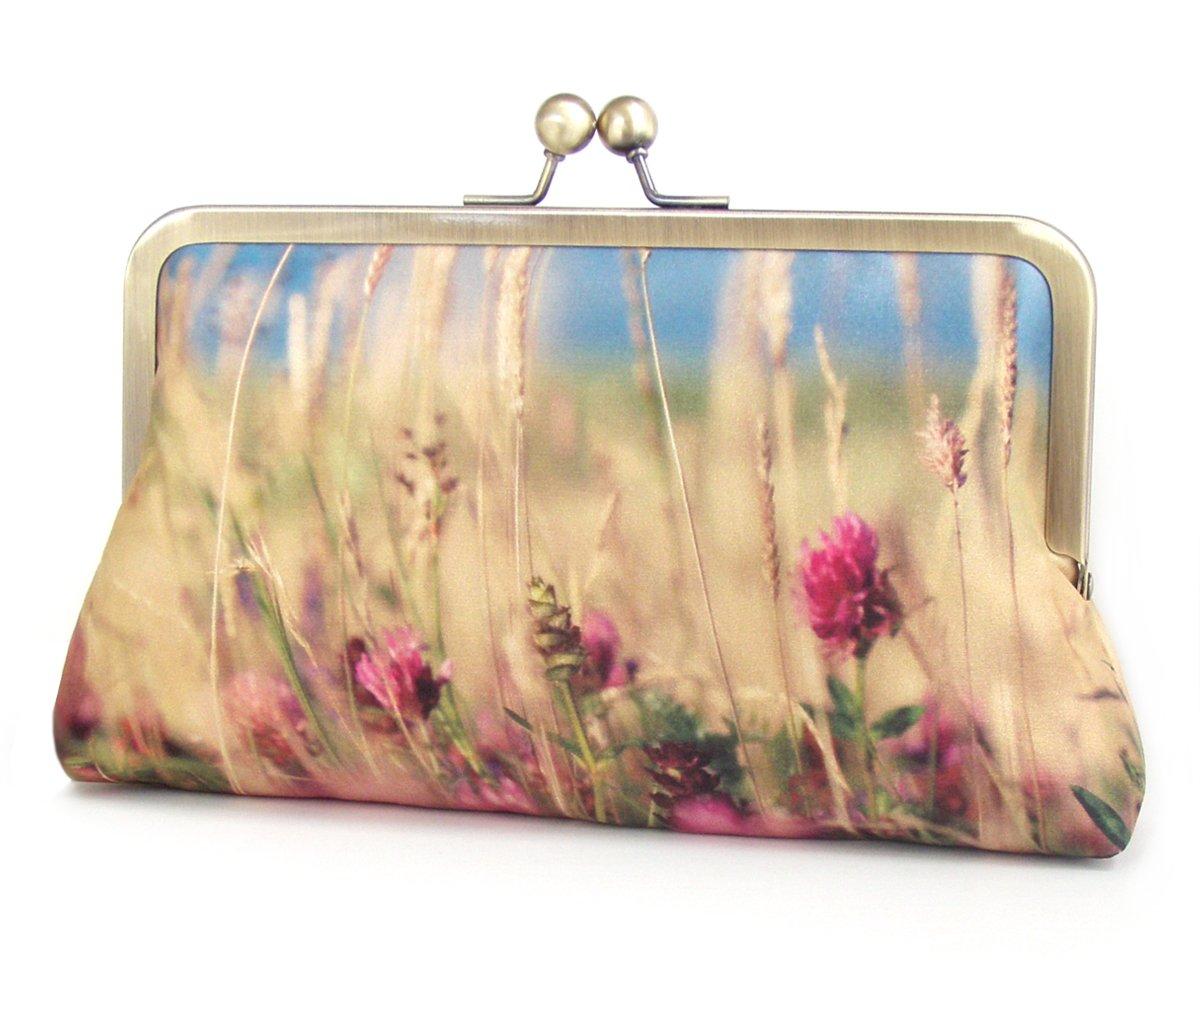 Image of Wildflowers clutch bag, printed silk purse